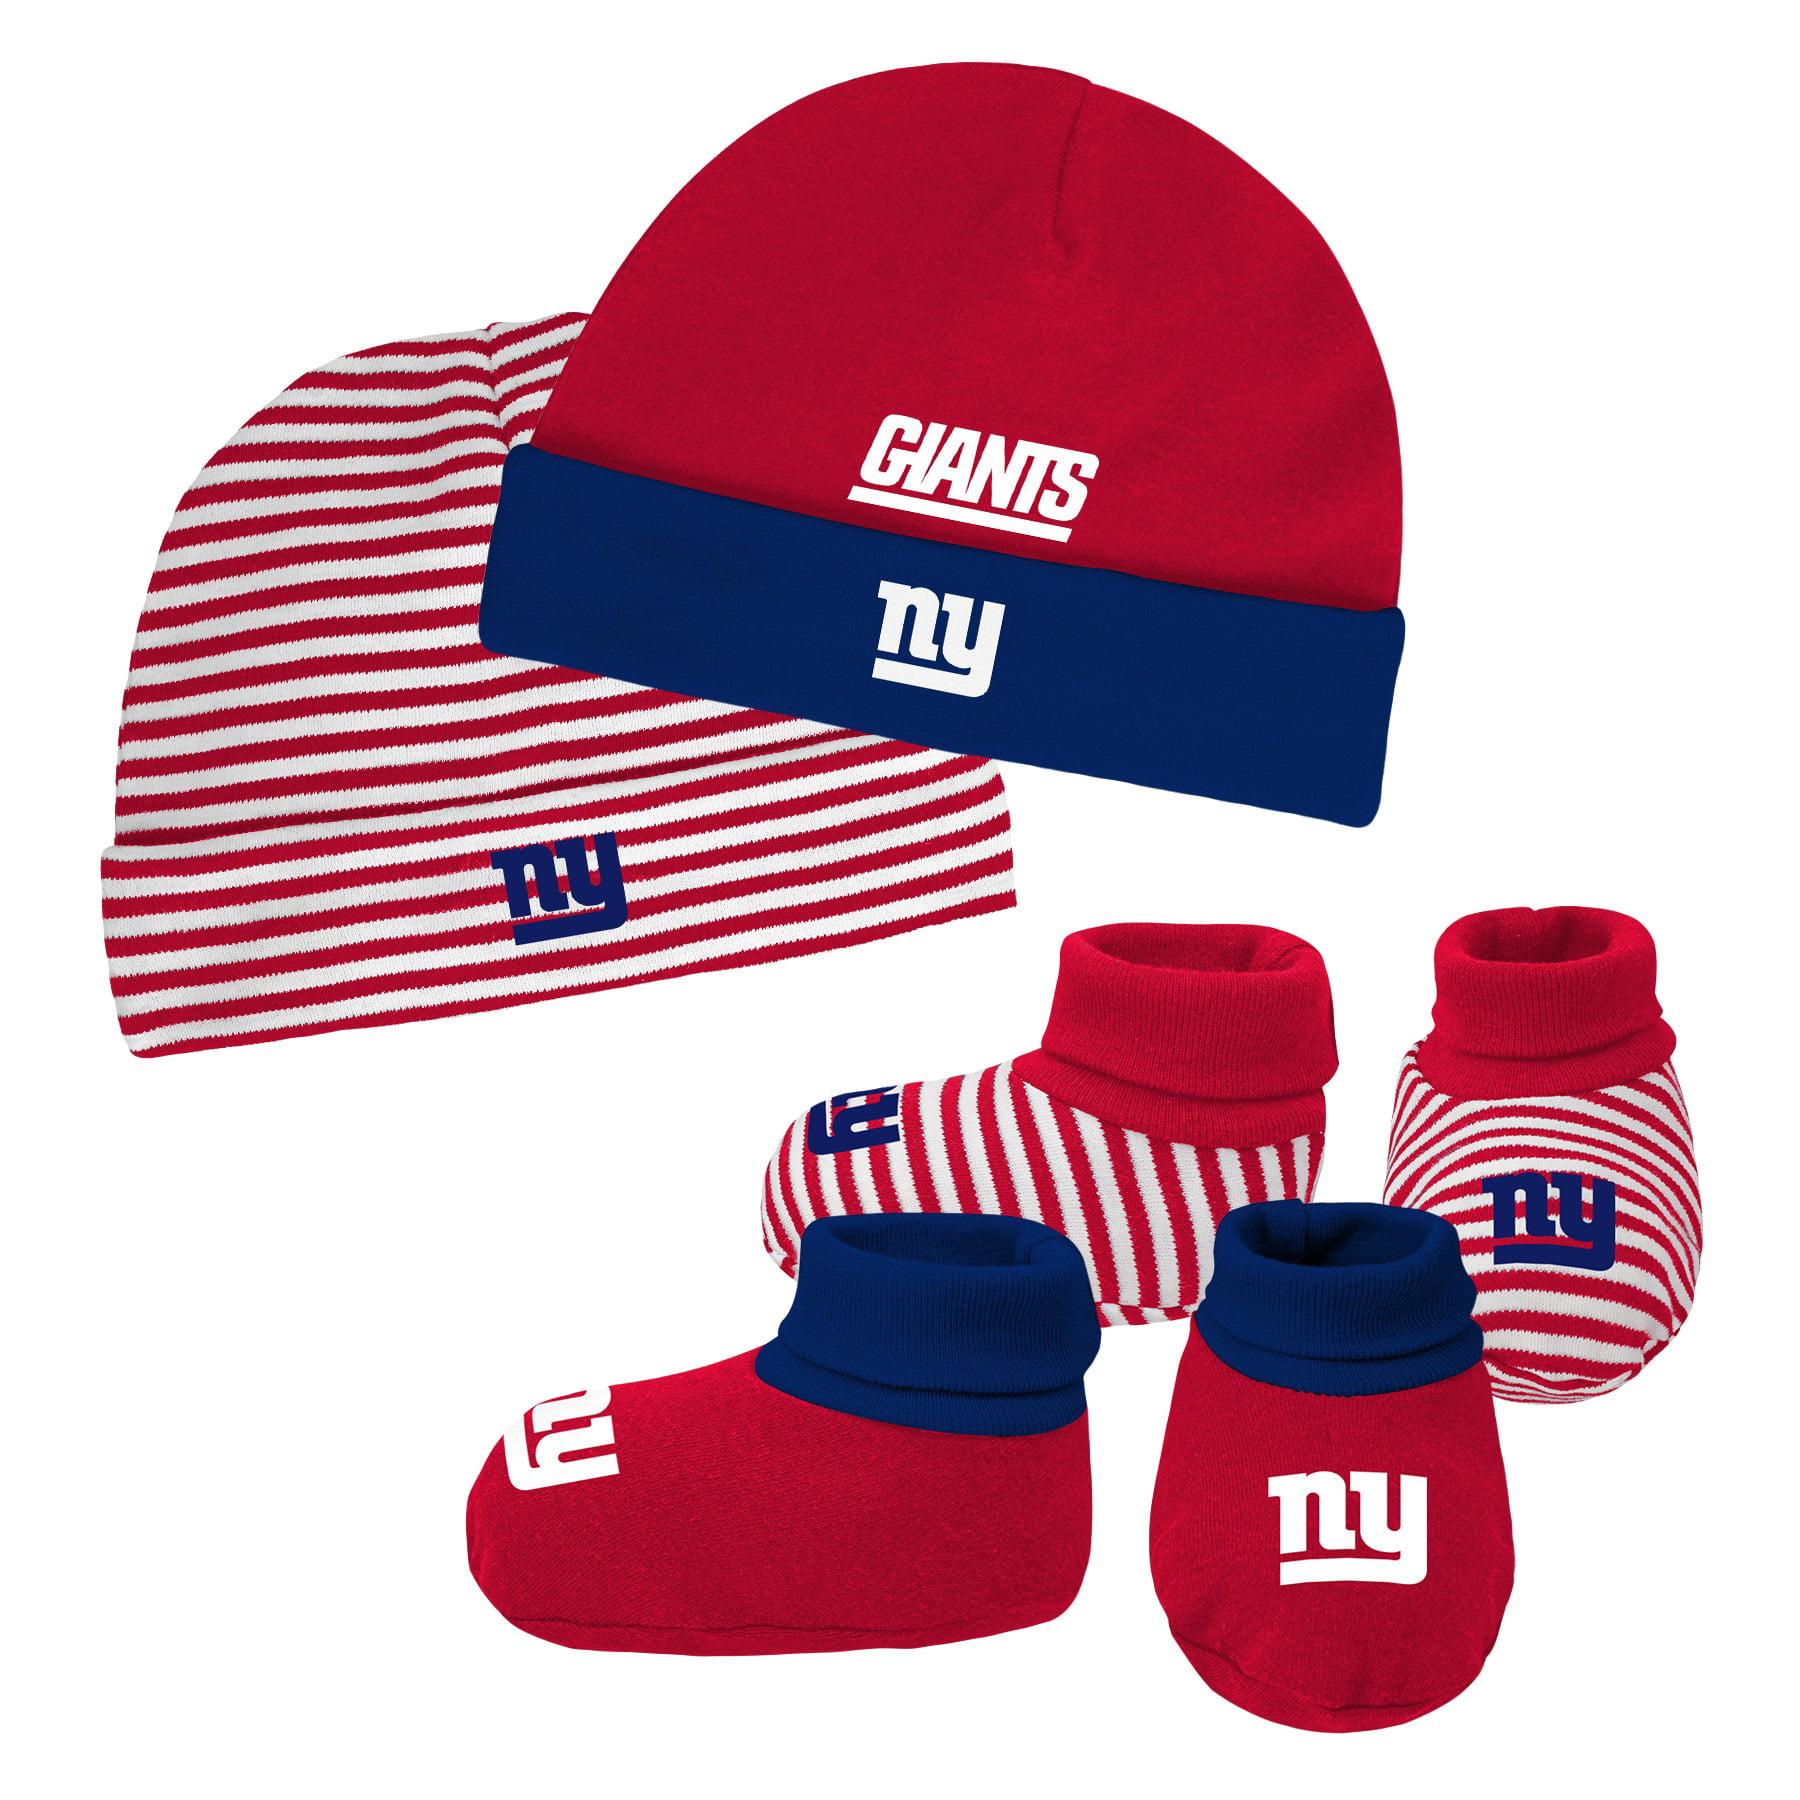 aee25457 Newborn & Infant Royal/Red New York Giants Cuffed Knit Hat & Booties Set -  Newborn